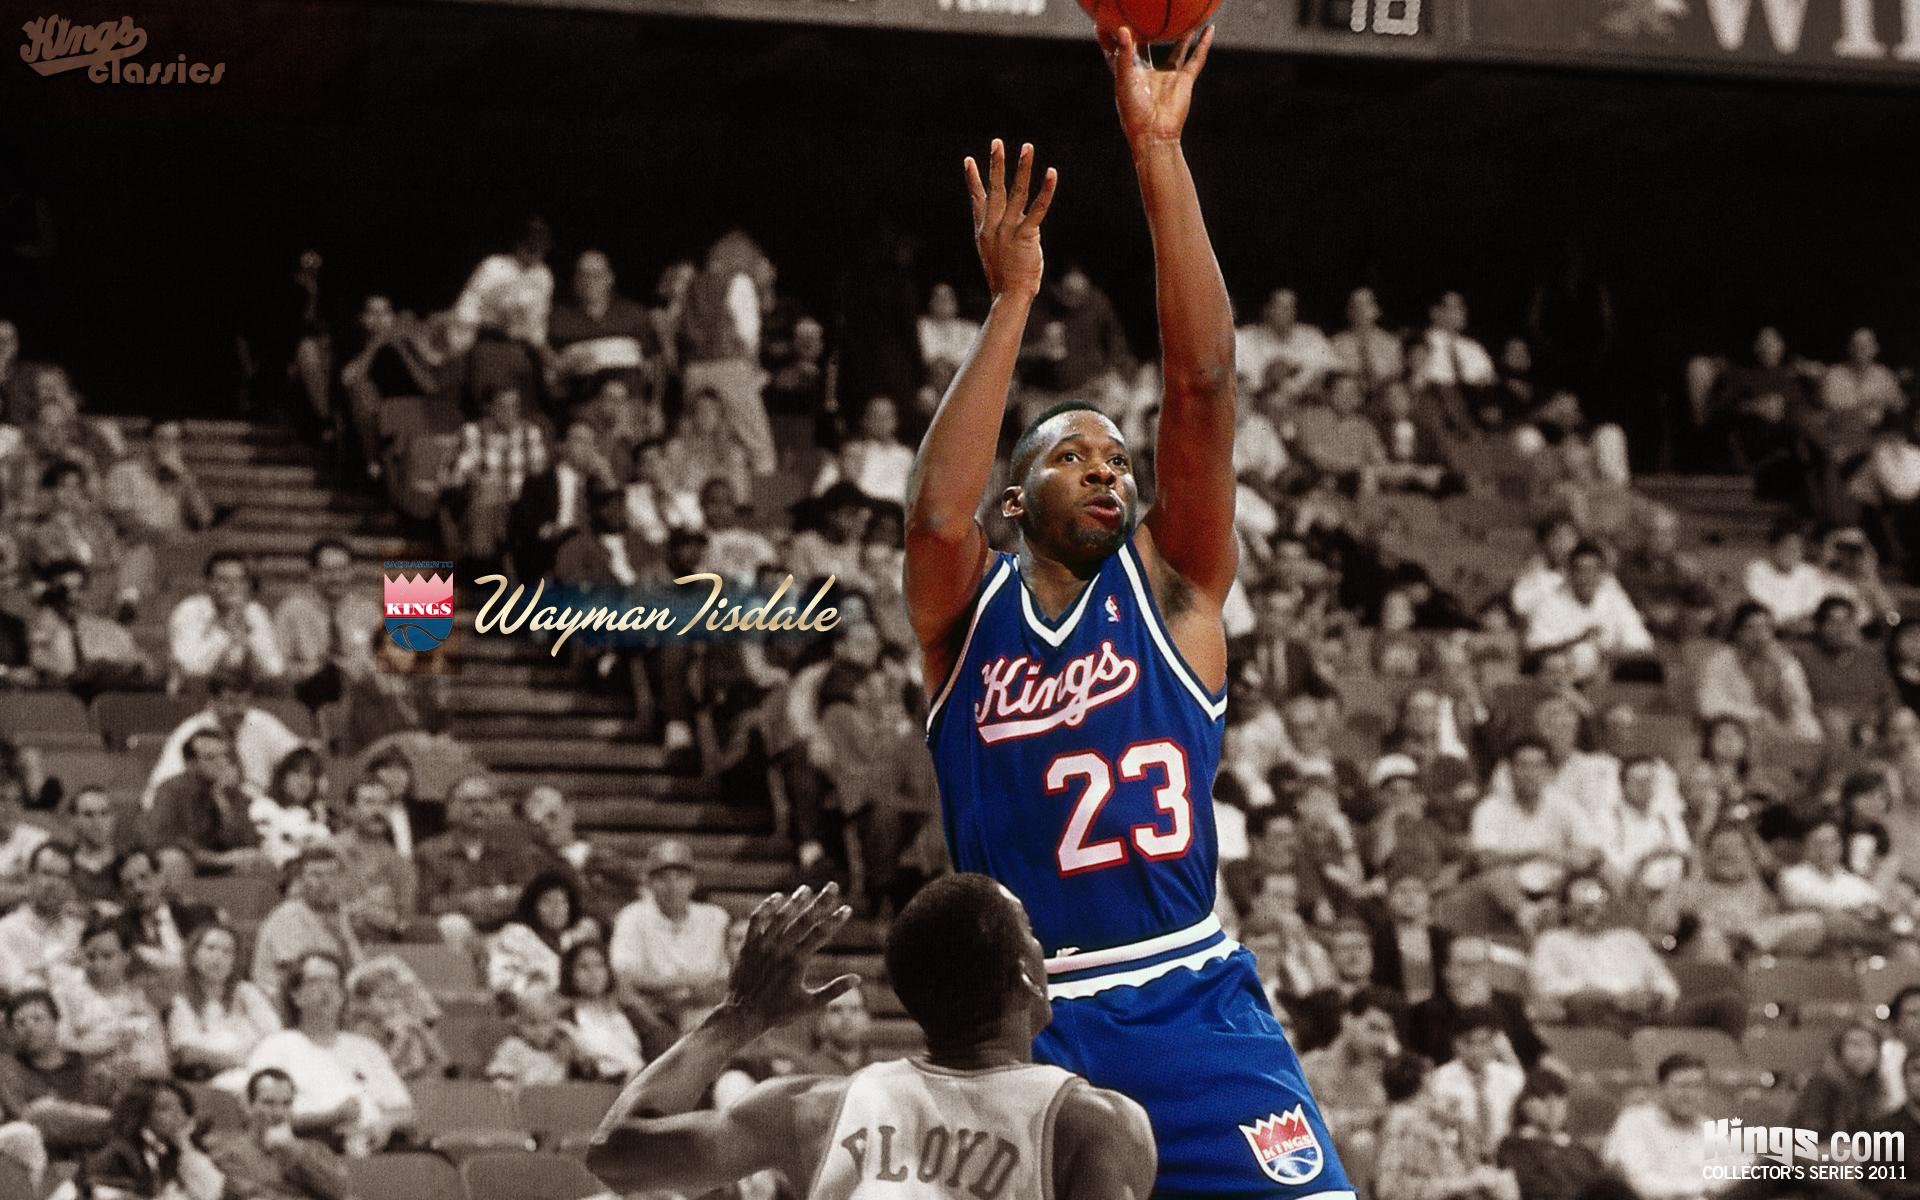 SACRAMENTO KINGS nba basketball 4 wallpaper 1920x1200 227712 1920x1200